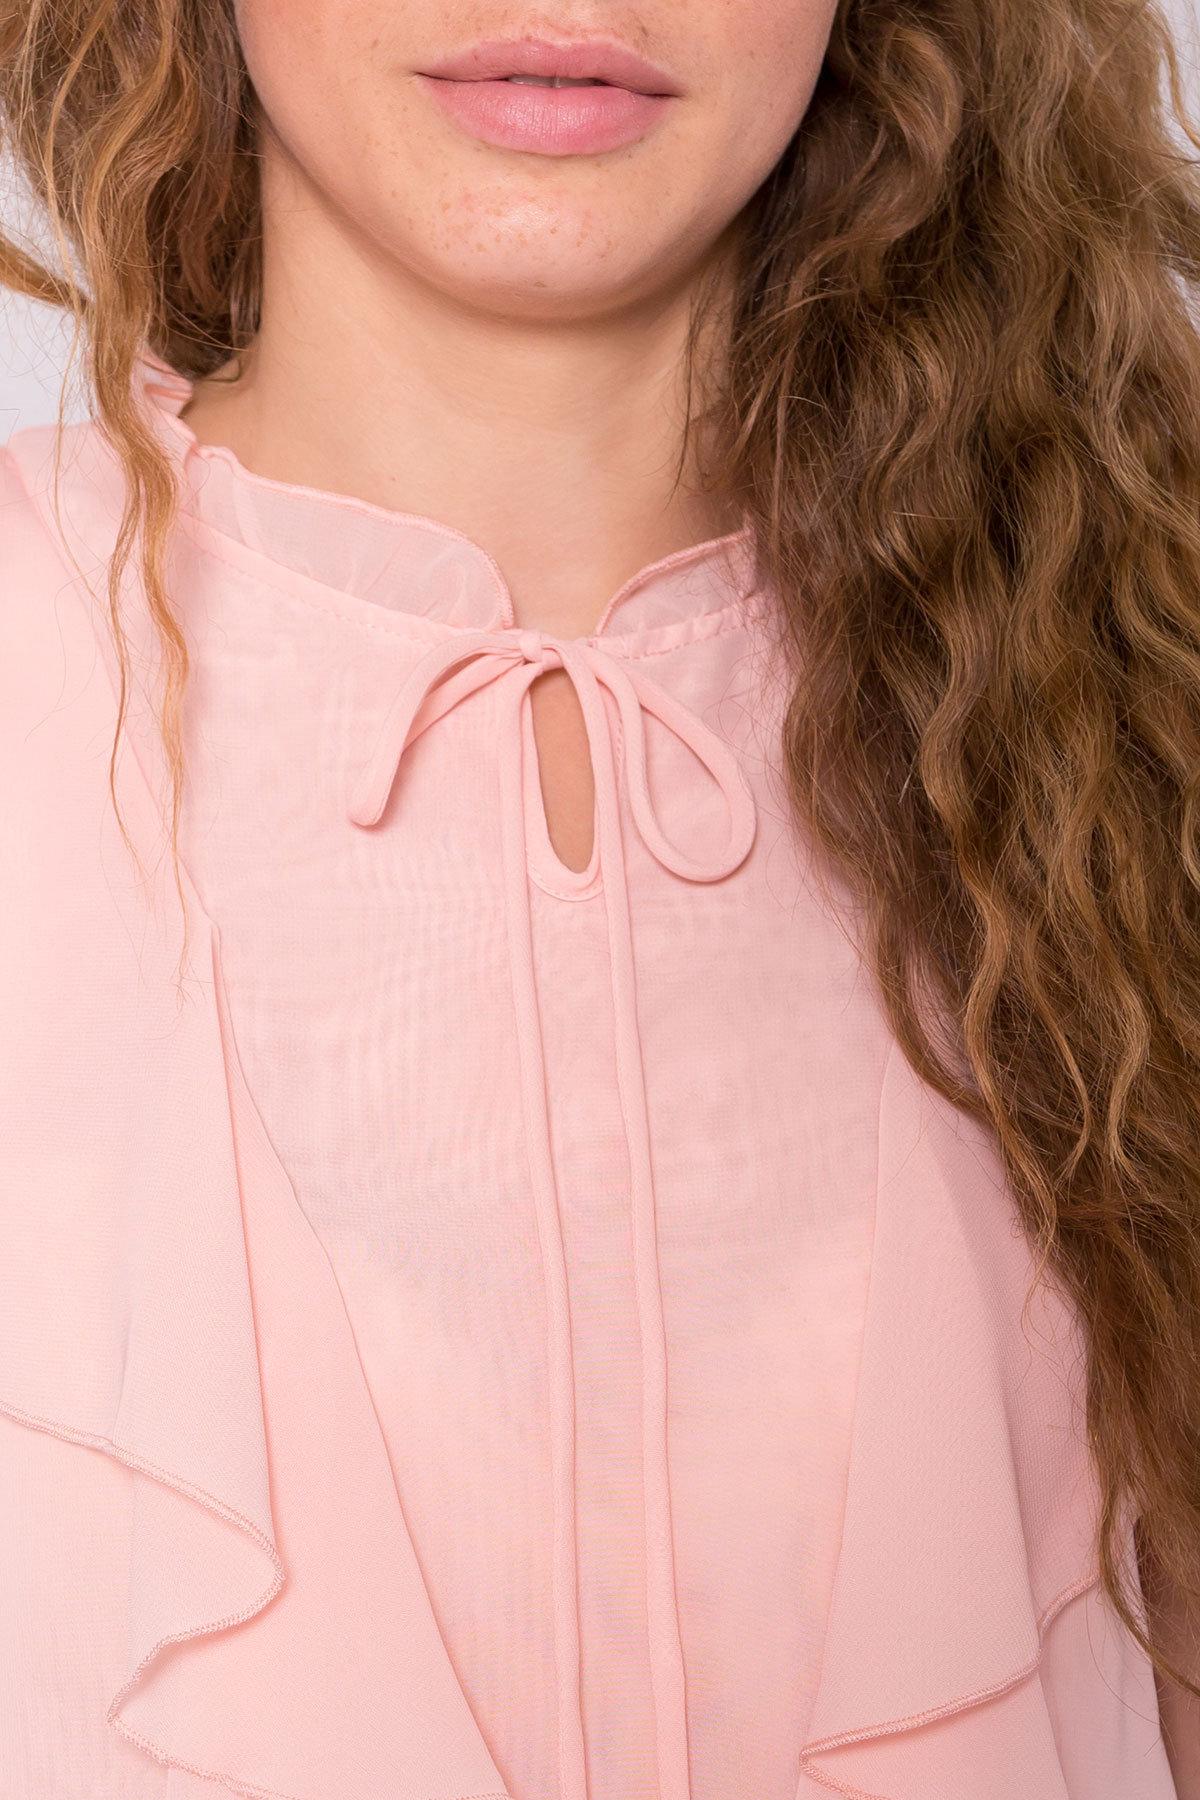 Блуза Дайан 7235 АРТ. 42831 Цвет: Пудра 5 - фото 4, интернет магазин tm-modus.ru